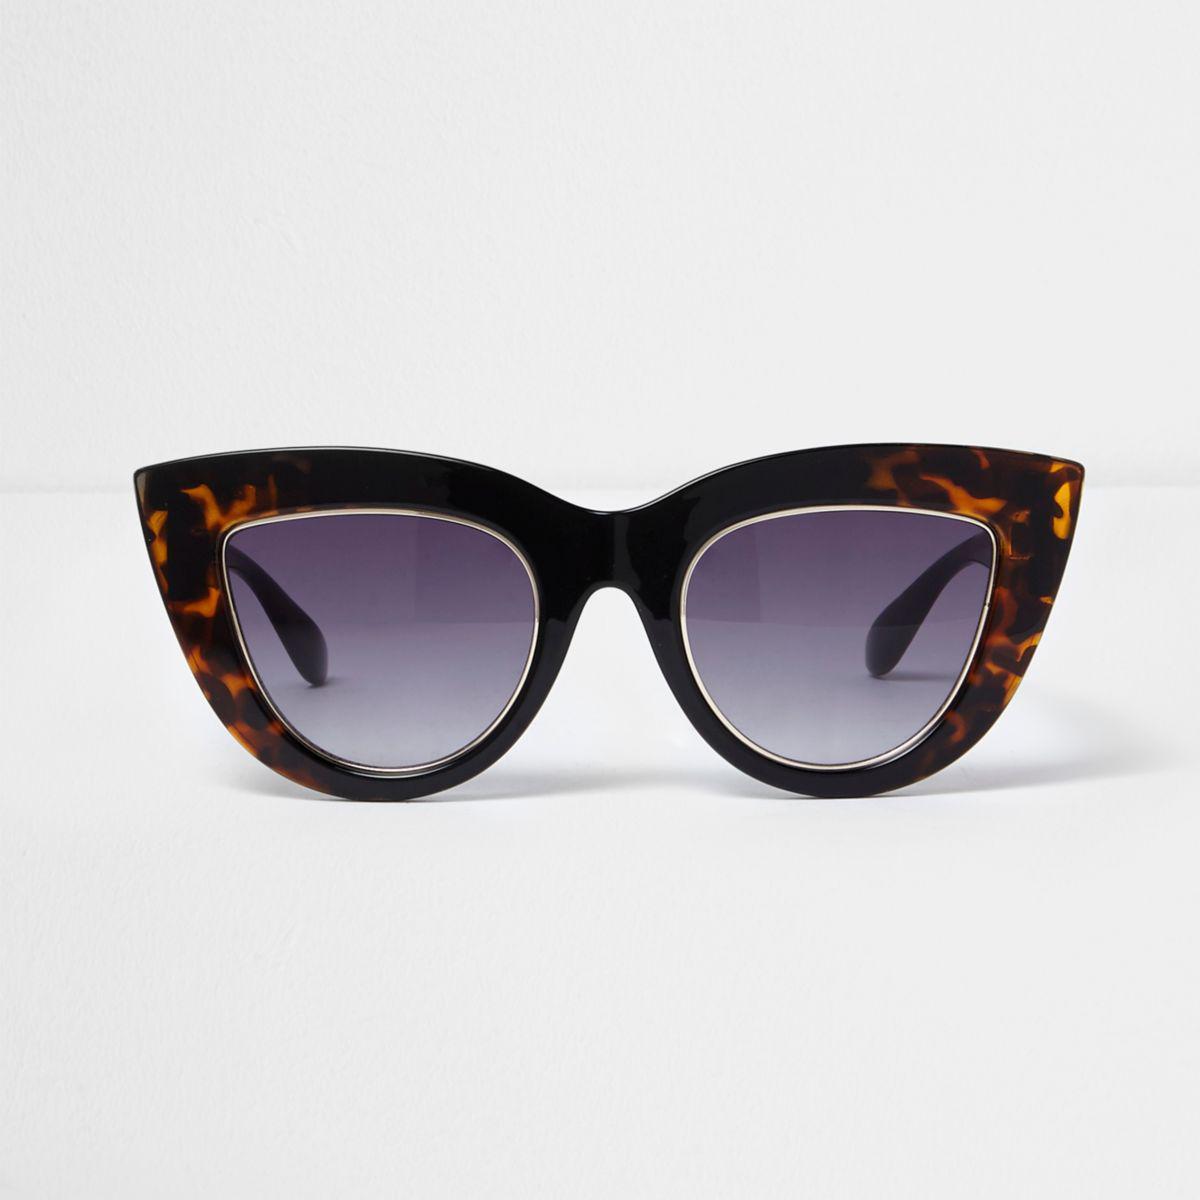 970ed10cabad Lyst - River Island Black Tortoiseshell Smoke Cat Eye Sunglasses in ...